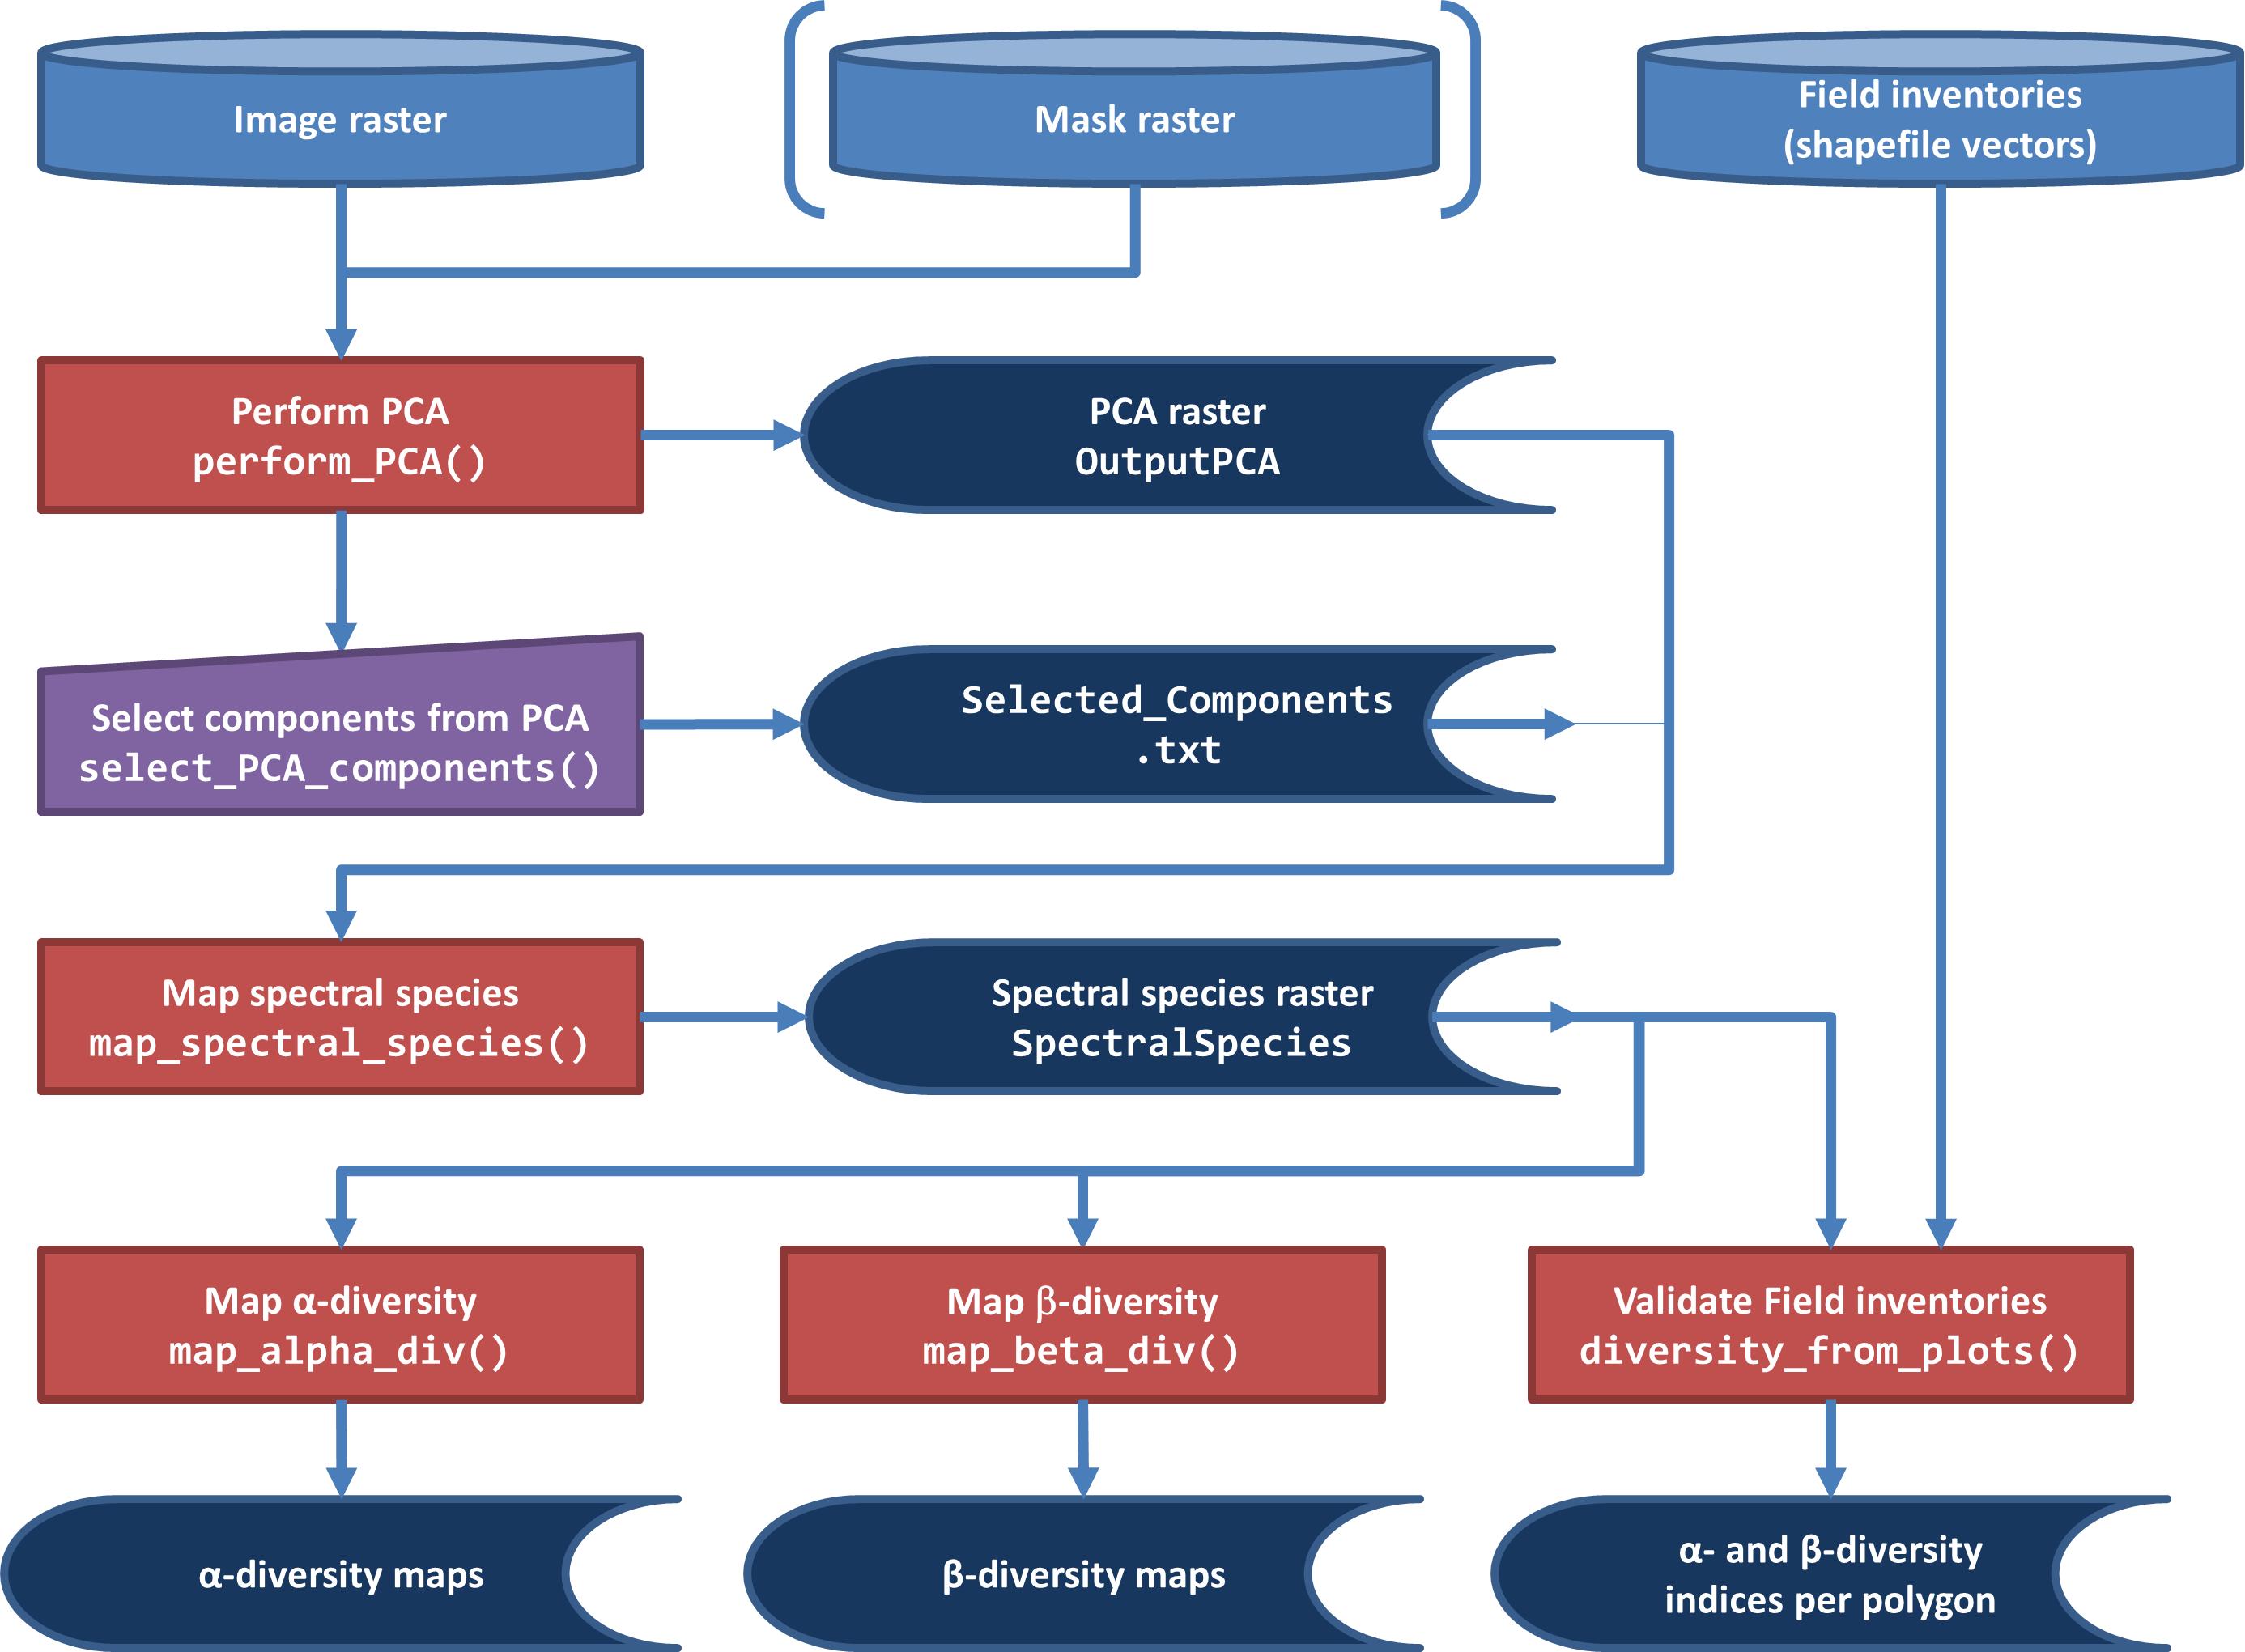 man/figures/Figure1_FlowChart_biodivMapR_Process_600DPI.png